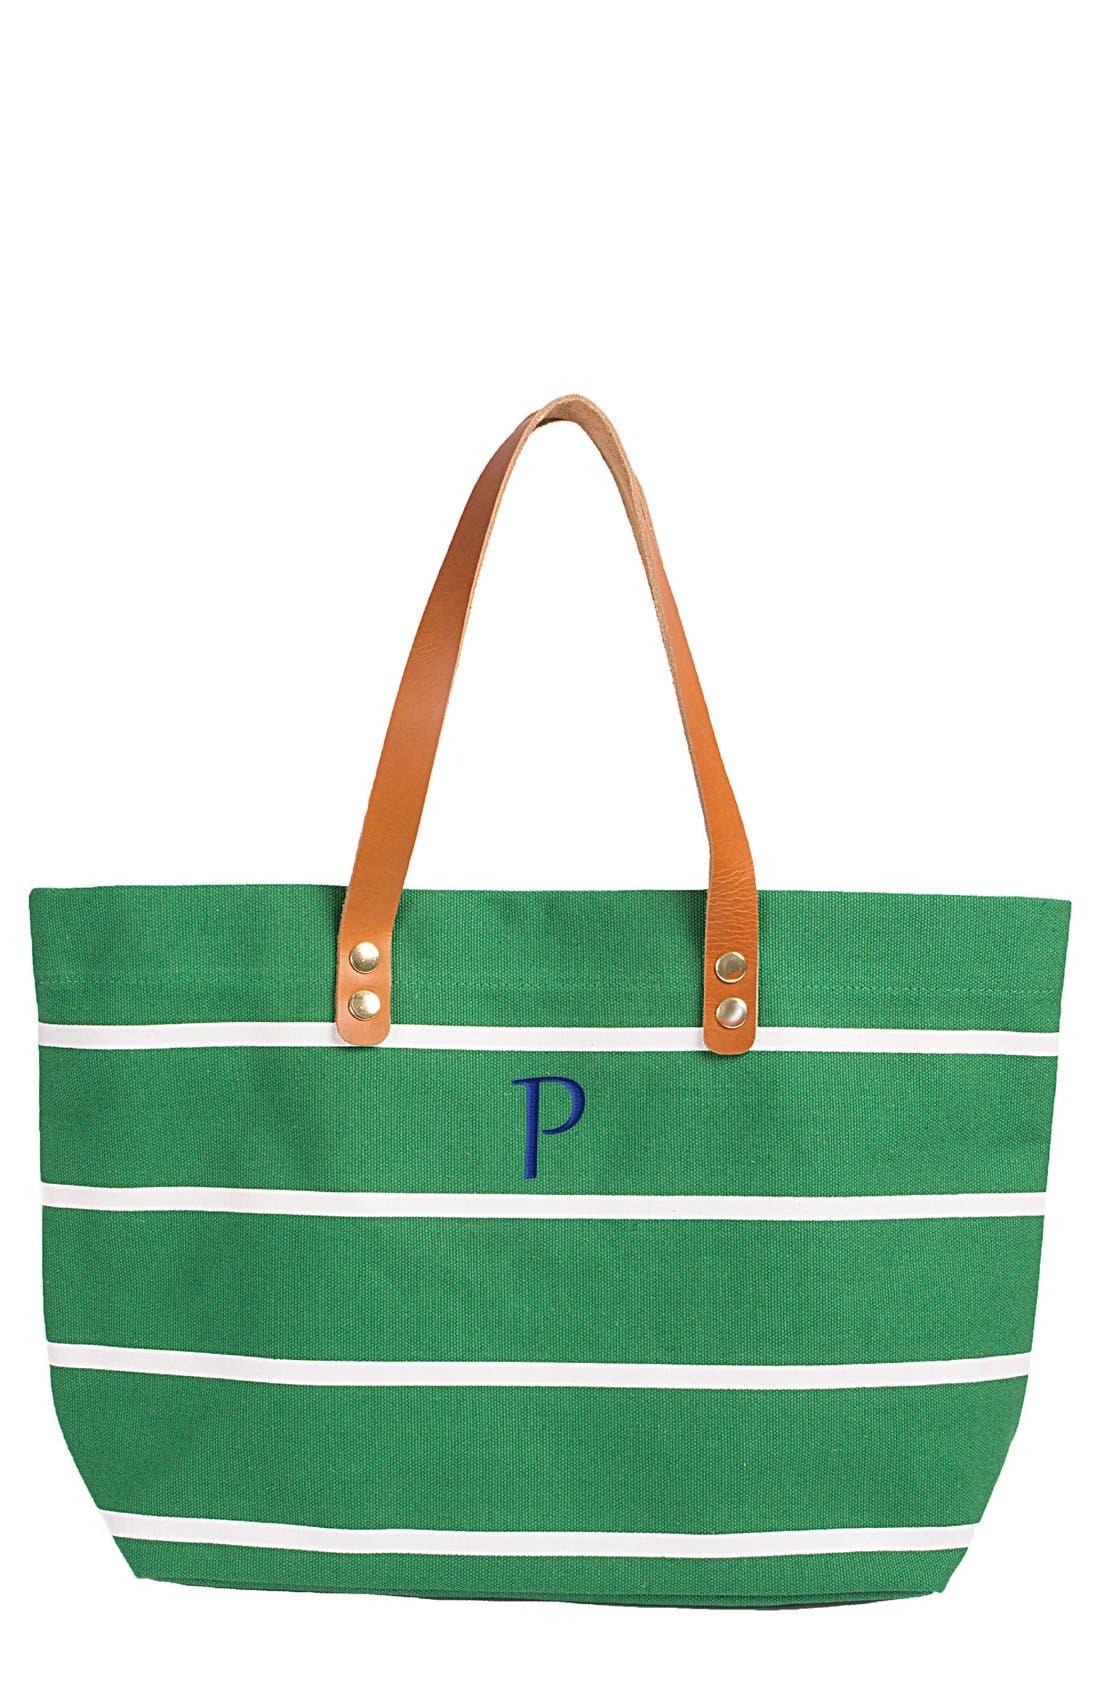 Monogram Stripe Tote,                         Main,                         color, Green-P